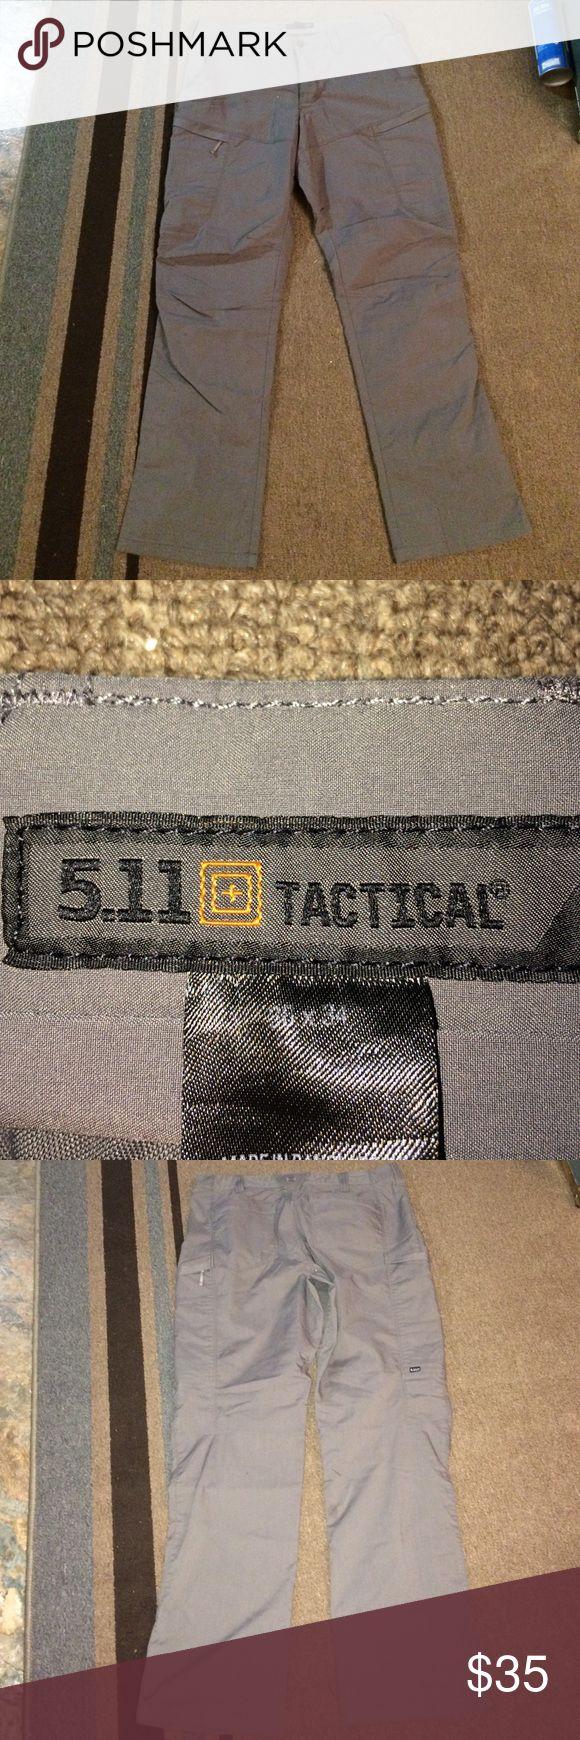 Men's tactical grey cargo pants Men's tactical pants 36 x 34 size 511 tactical Pants